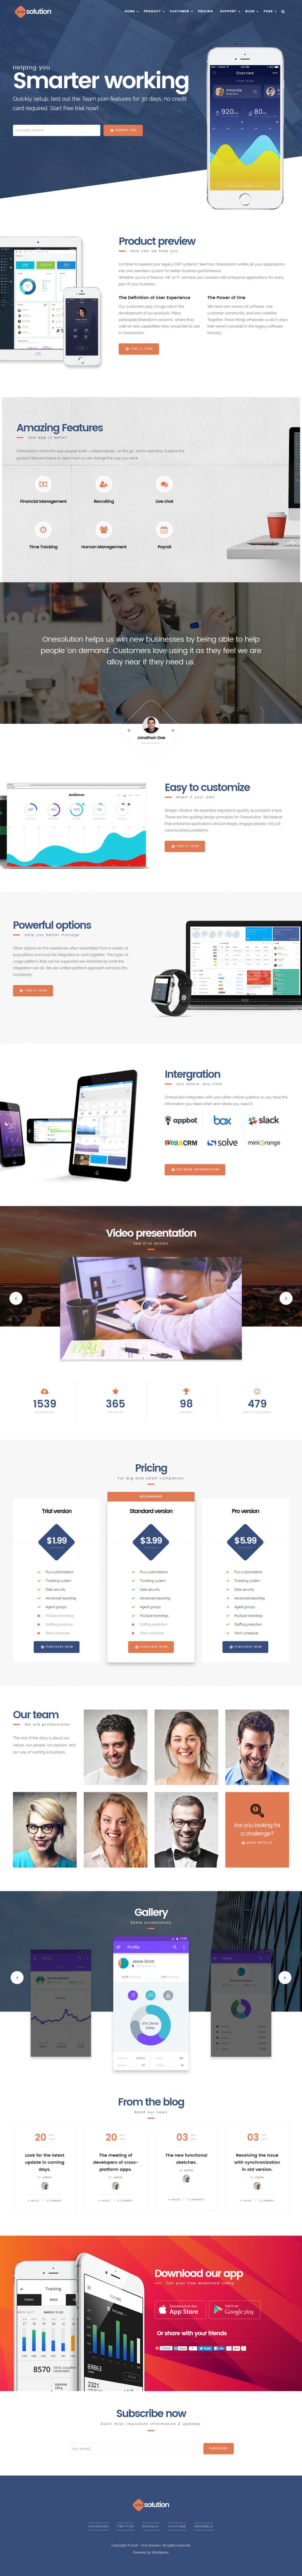 OneSolution – Application Showcase